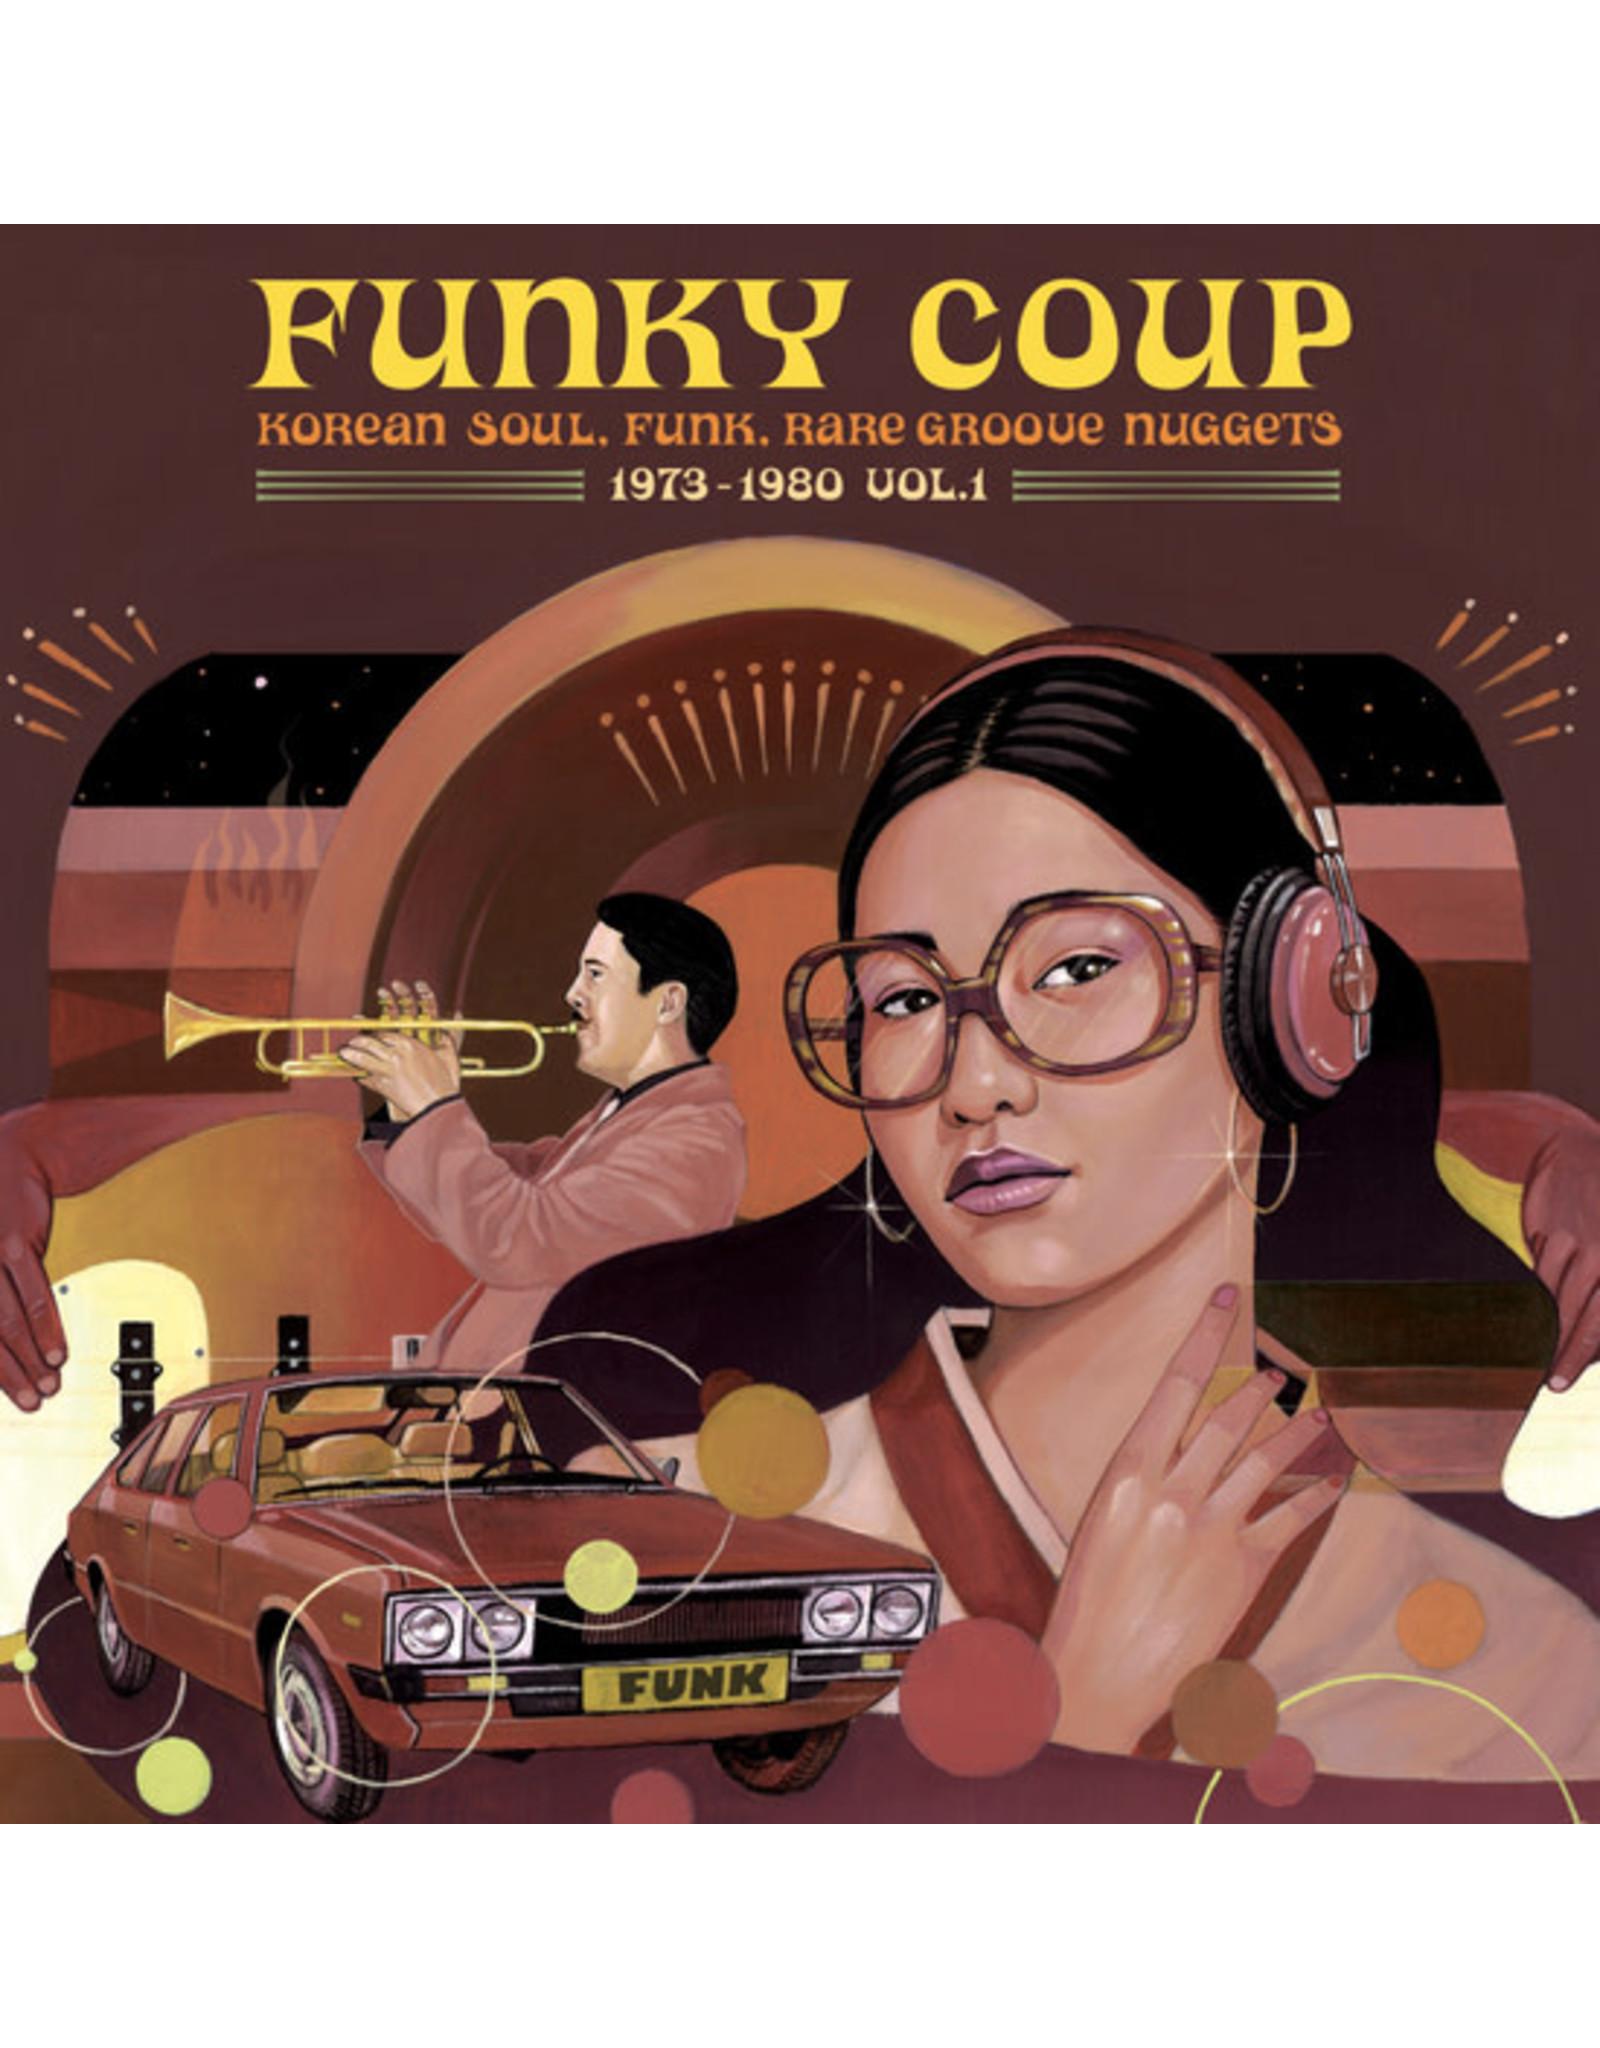 New Vinyl Various - Funky Coup: Korean Soul, Funk & Rare Groove Nuggets 1973-1980 Vol. 1 (Colored) 2LP